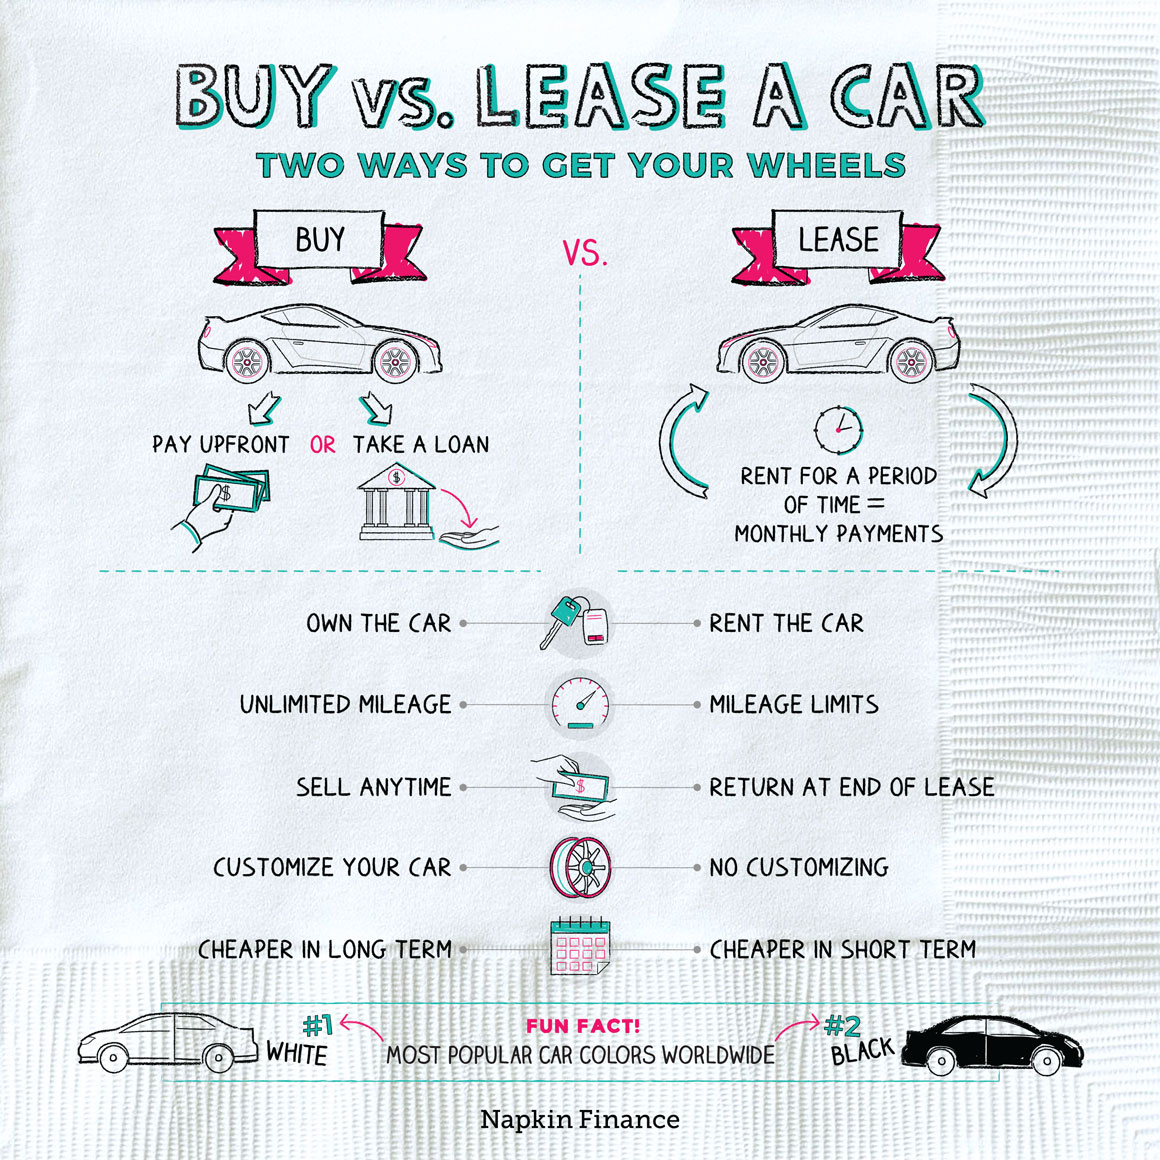 Buy vs. Lease A Car